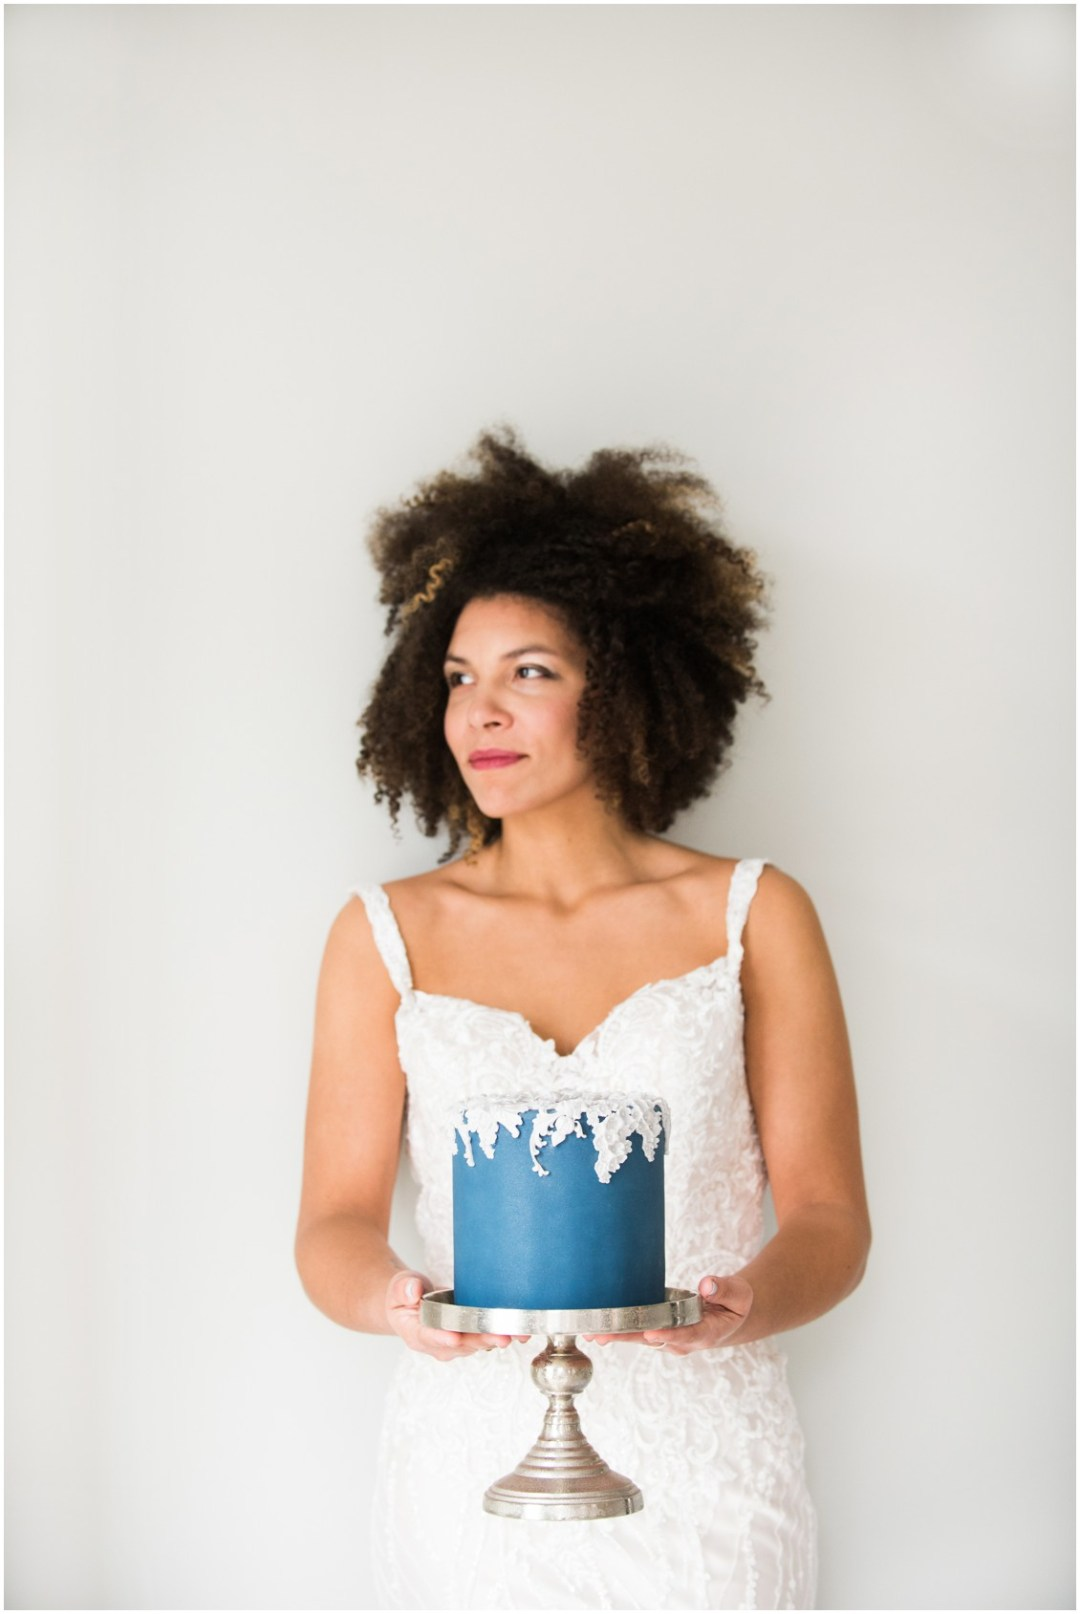 Bride Holding Blue Wedding Cake | 5 Things to Consider When Choosing Your Wedding Cake Designer | Bridal Feature Image | My Eastern Shore Wedding | Chef Steve Konopelski